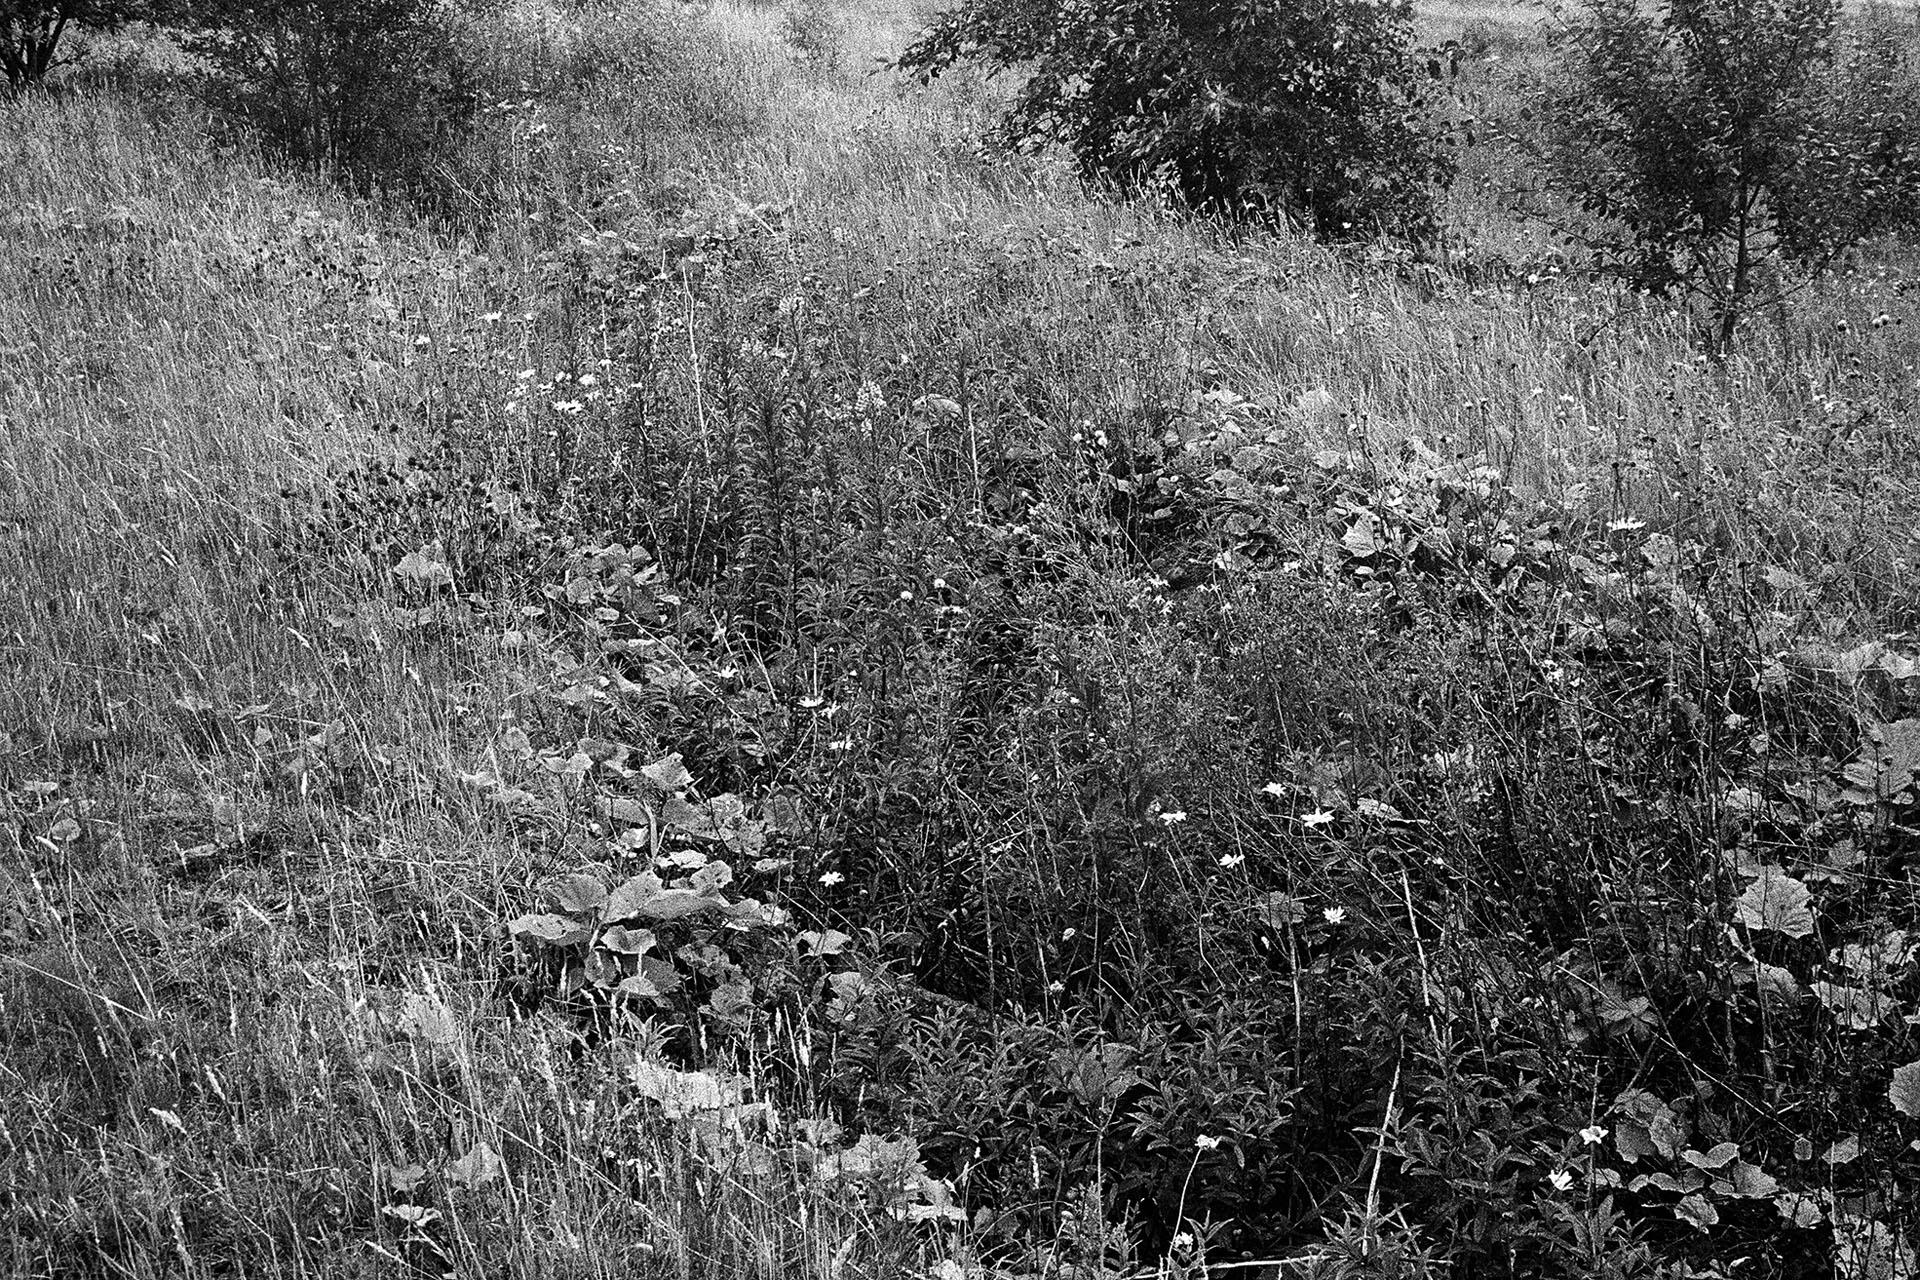 John Farrell - Unofficial Countryside